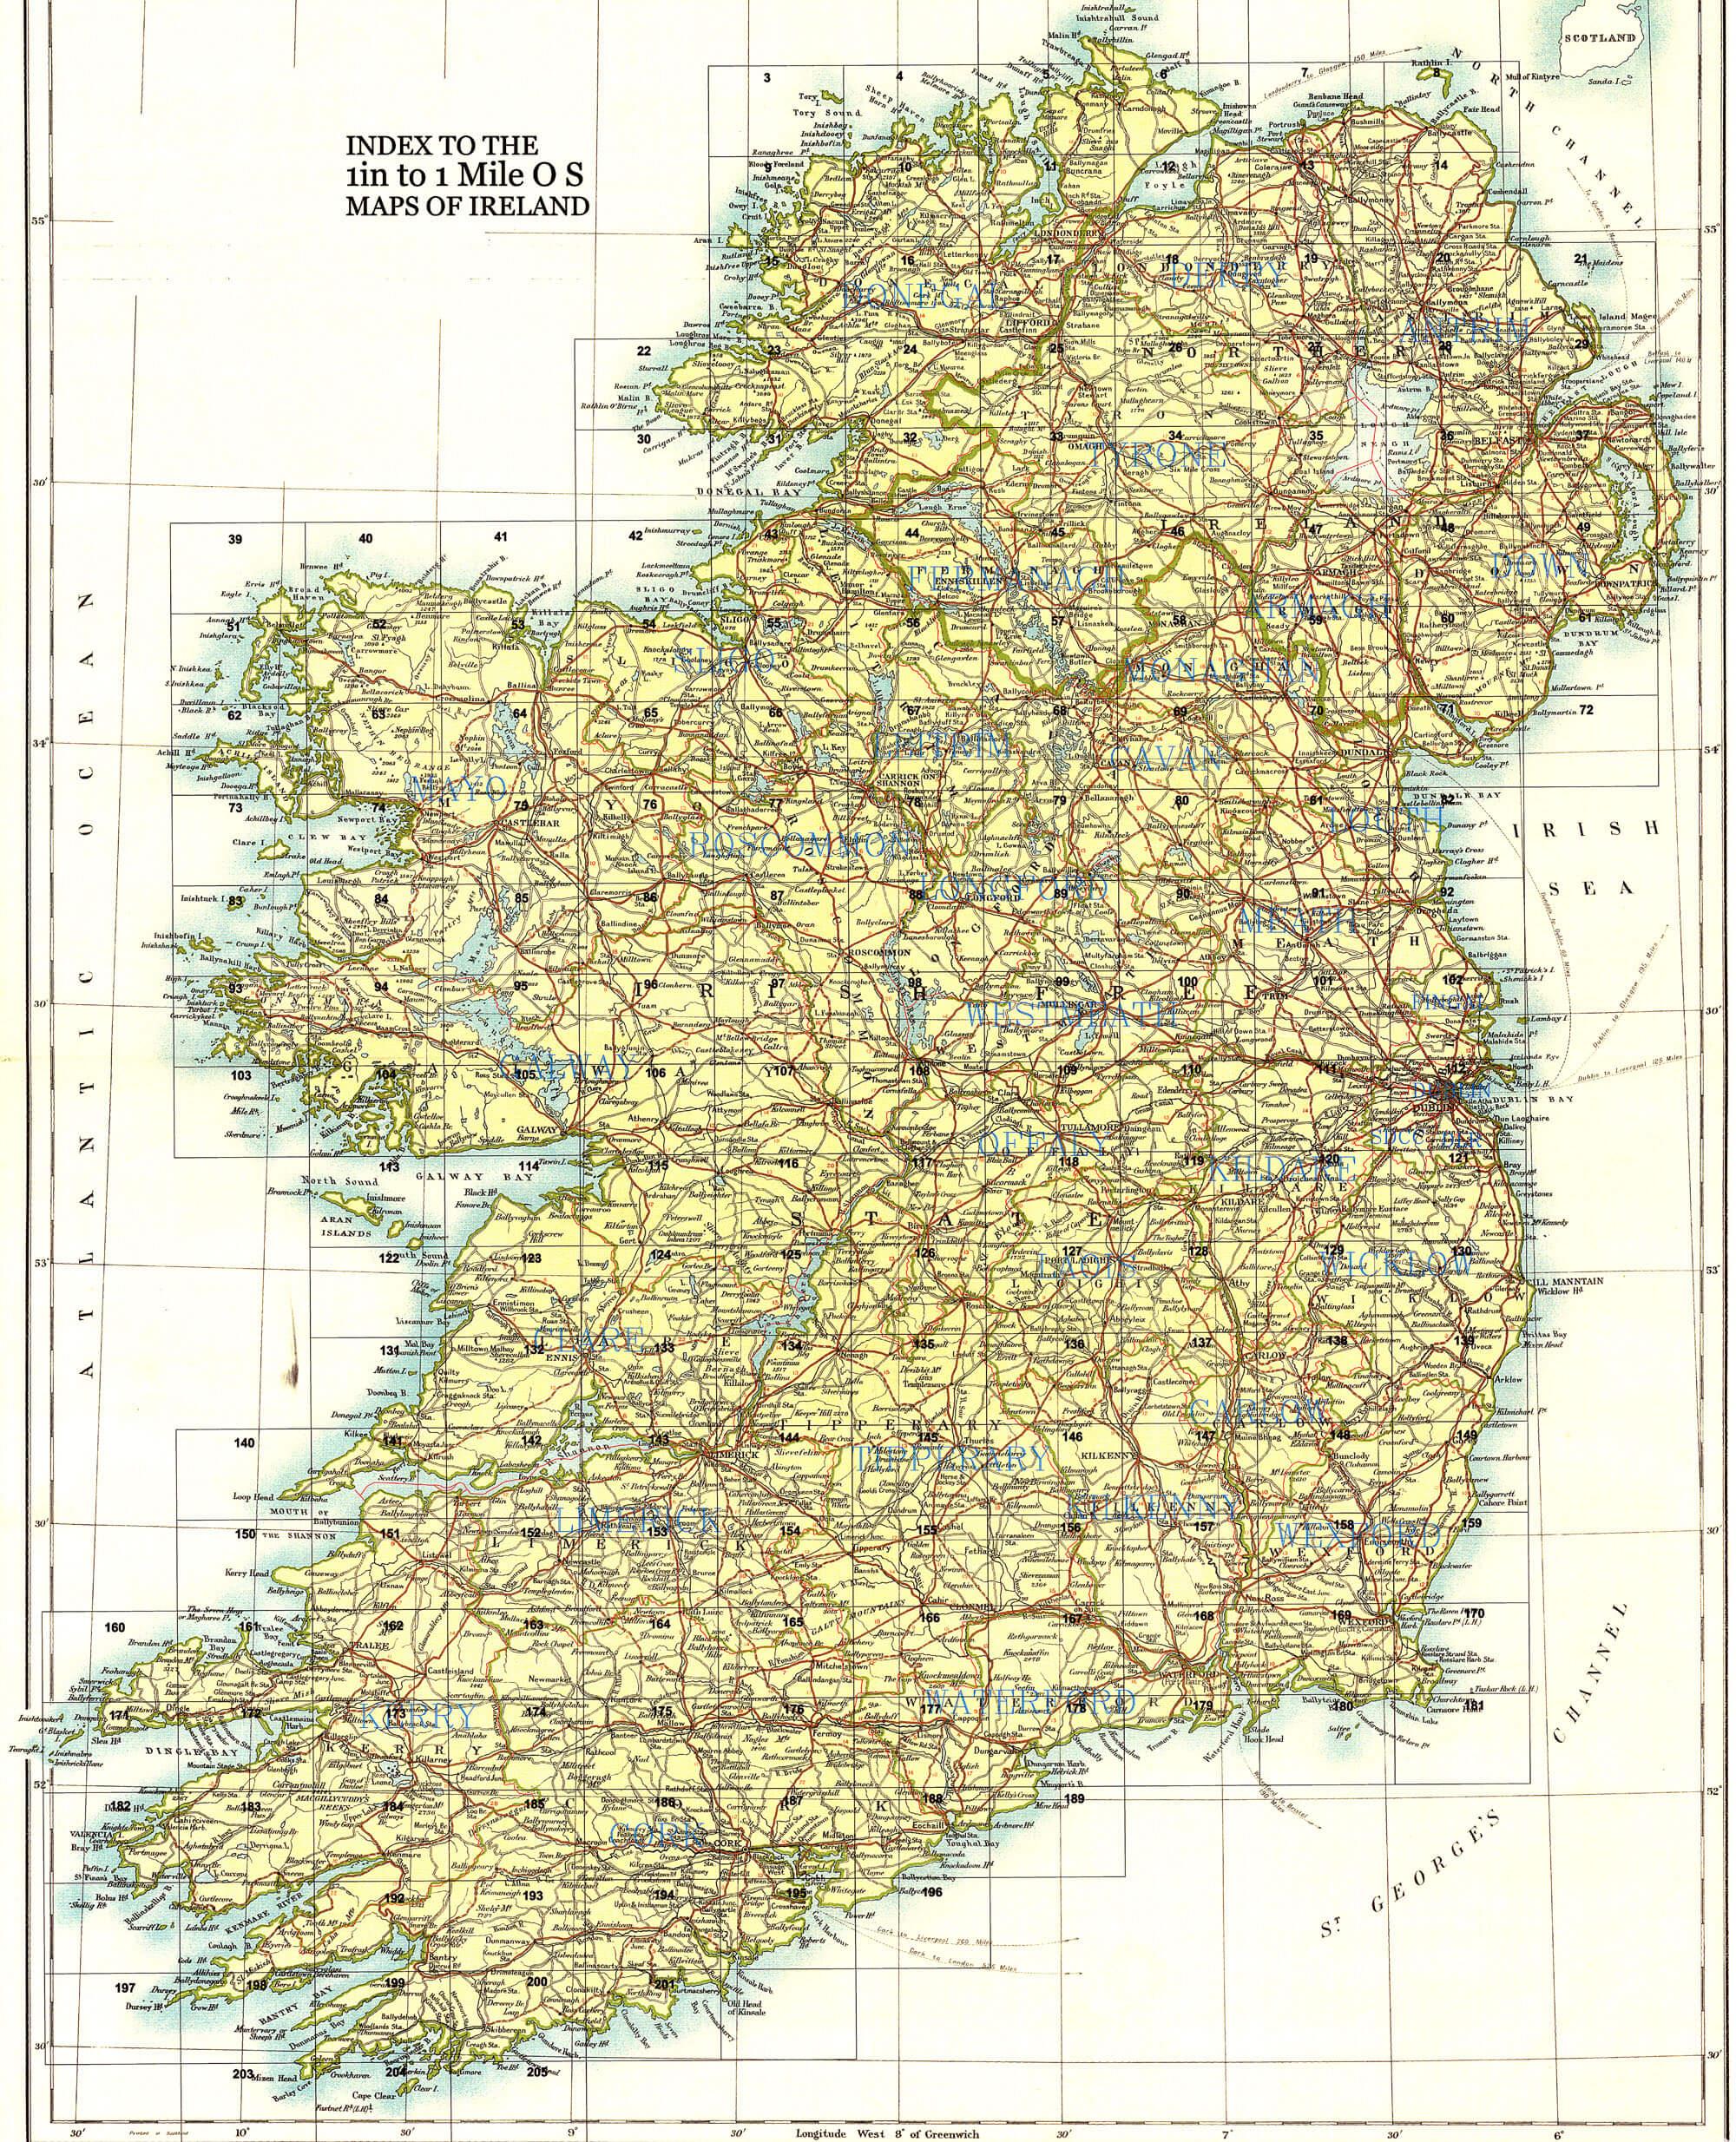 1980 Ordnance Survey 1//2 inch map IRELAND sheet 4 DERRY//TYRONE